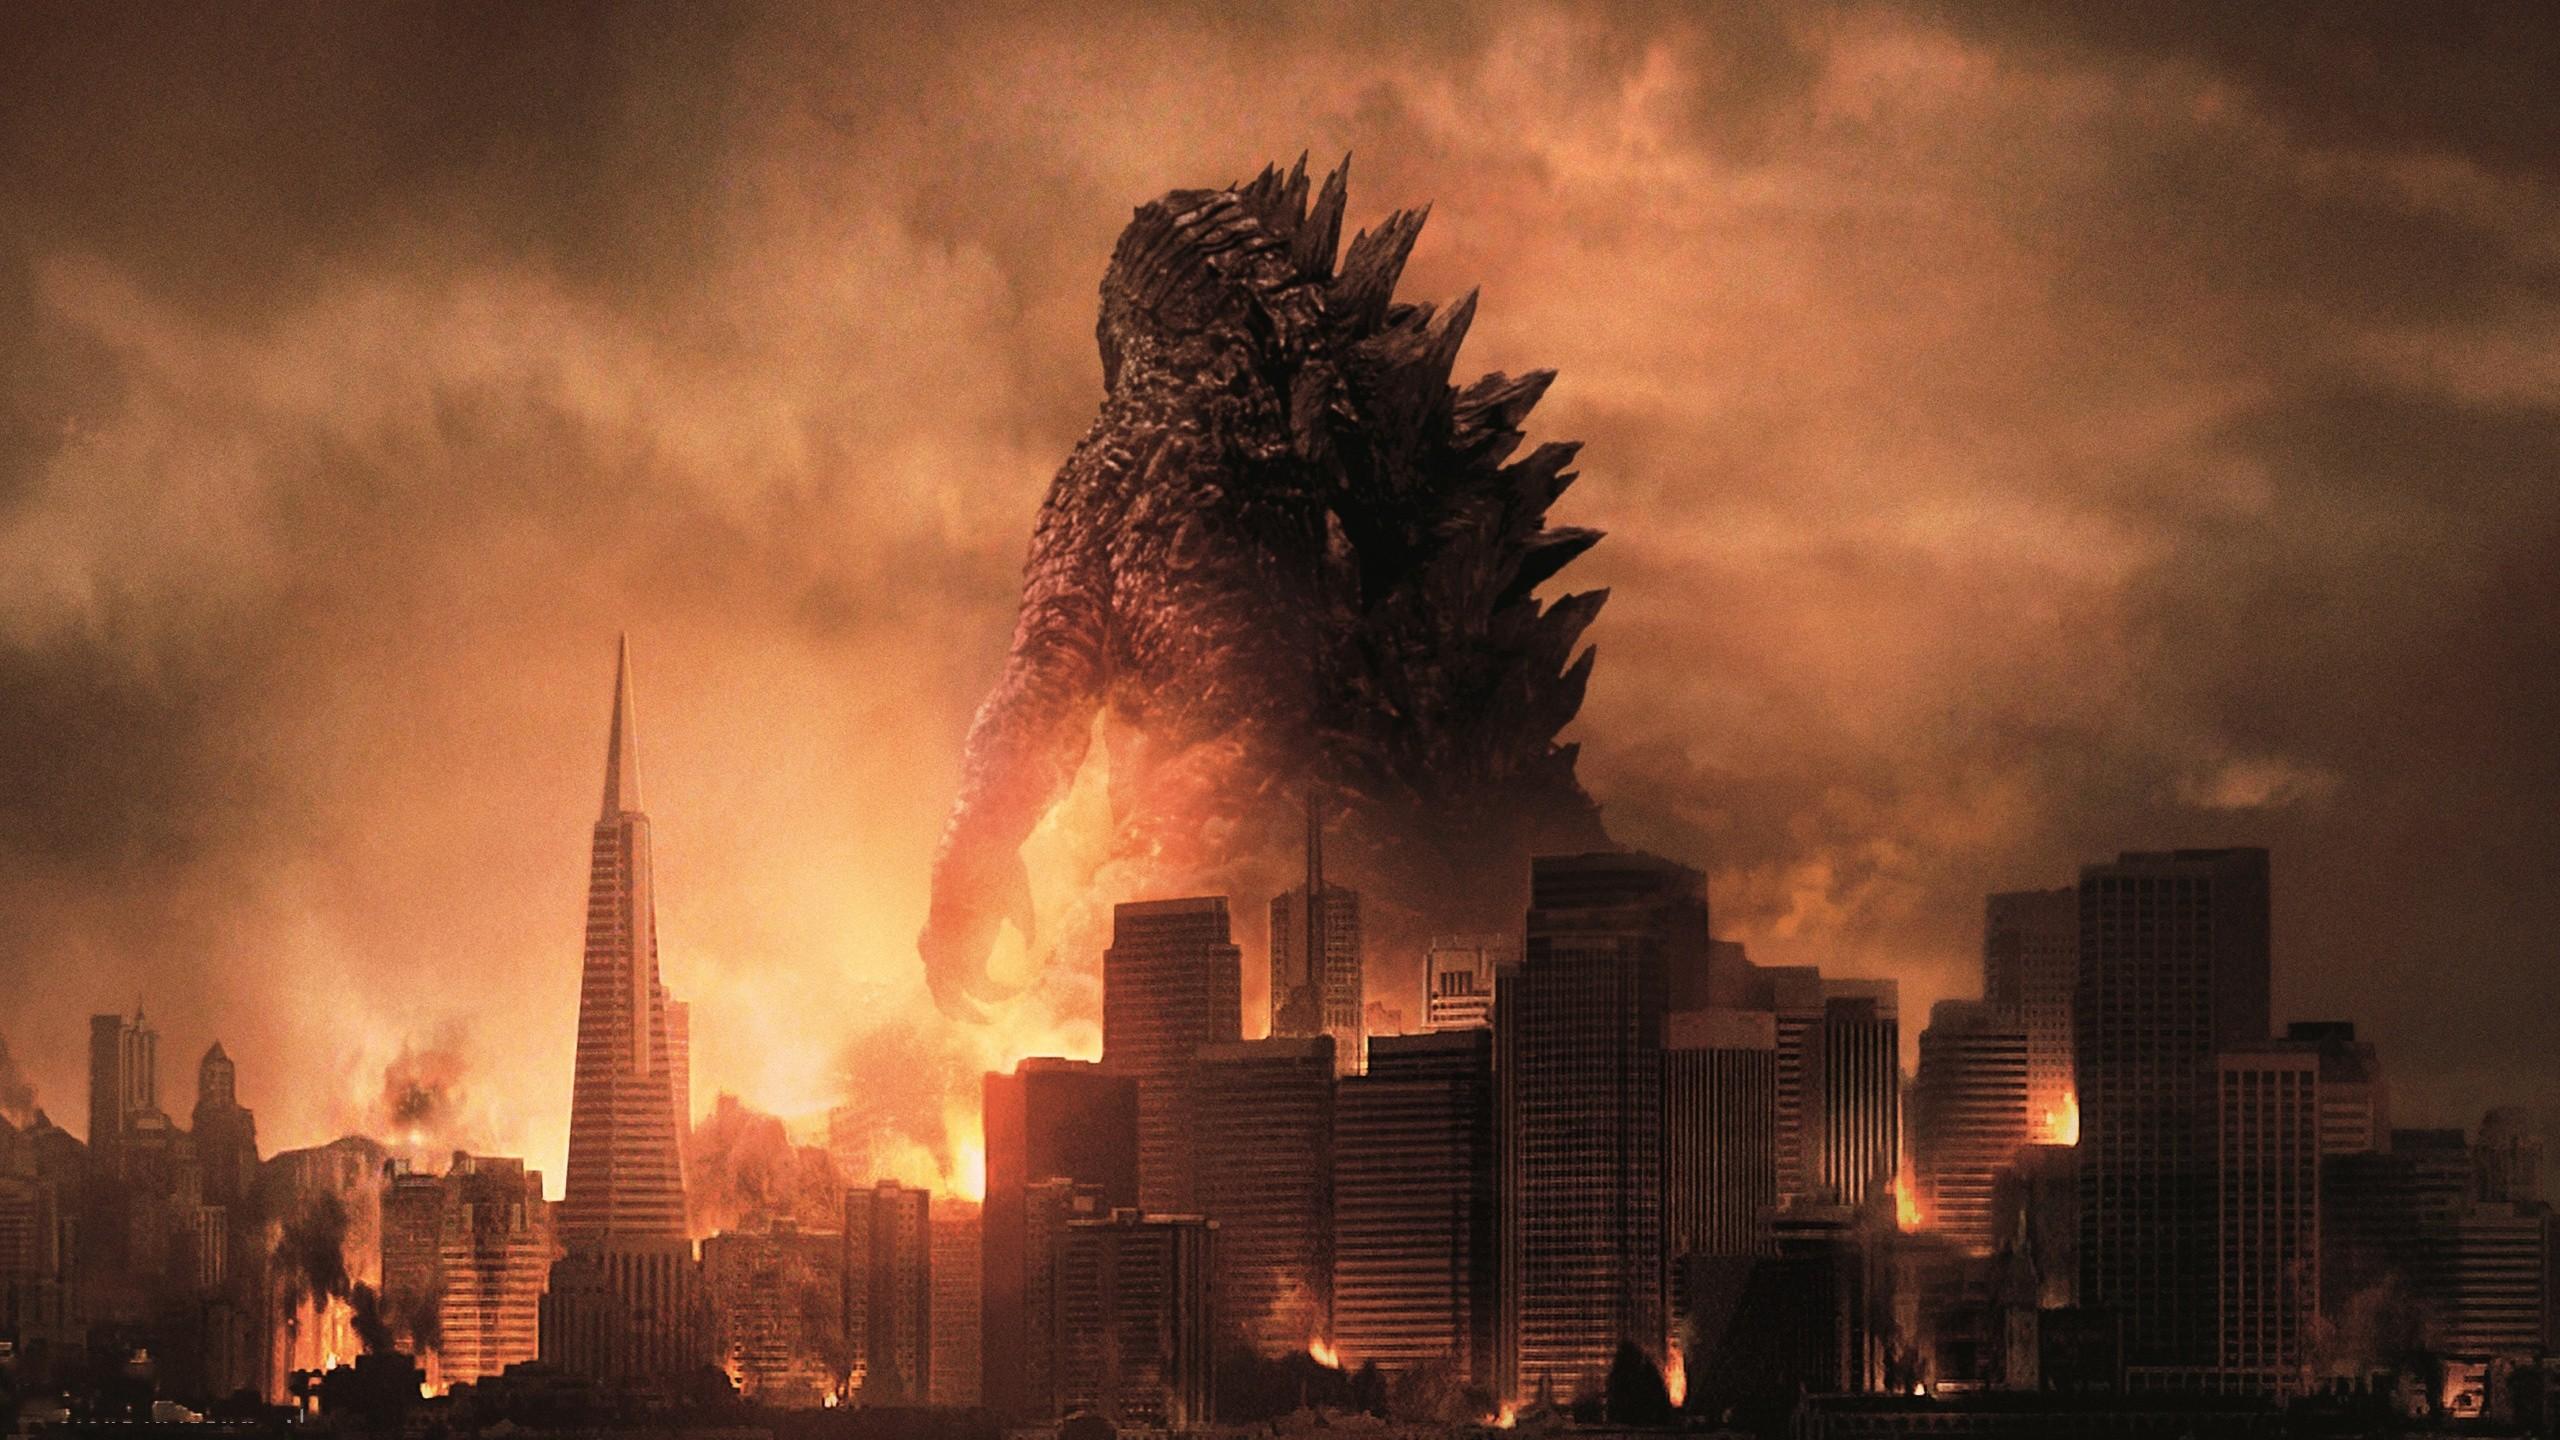 Godzilla Wallpapers HD Backgrounds | WallpapersIn4k.net